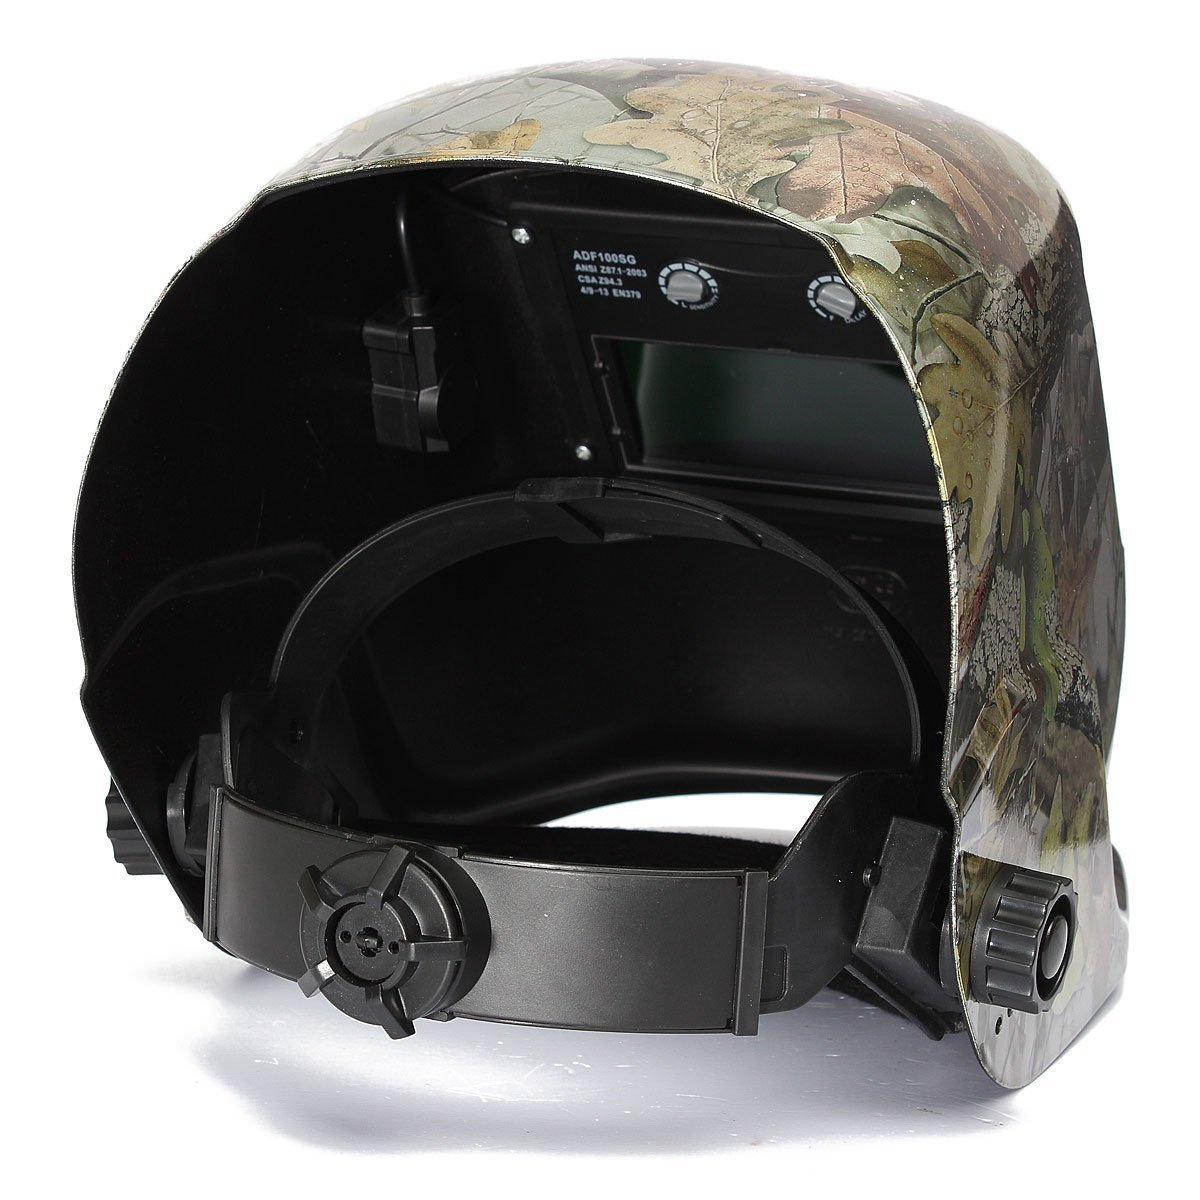 Youareking Adjustable Auto Darkening Solar Power Welding Helmet Forest Camo Arc Tig Mig Mask with 2pcs Extra Lens Covers (Autumn Leaf)